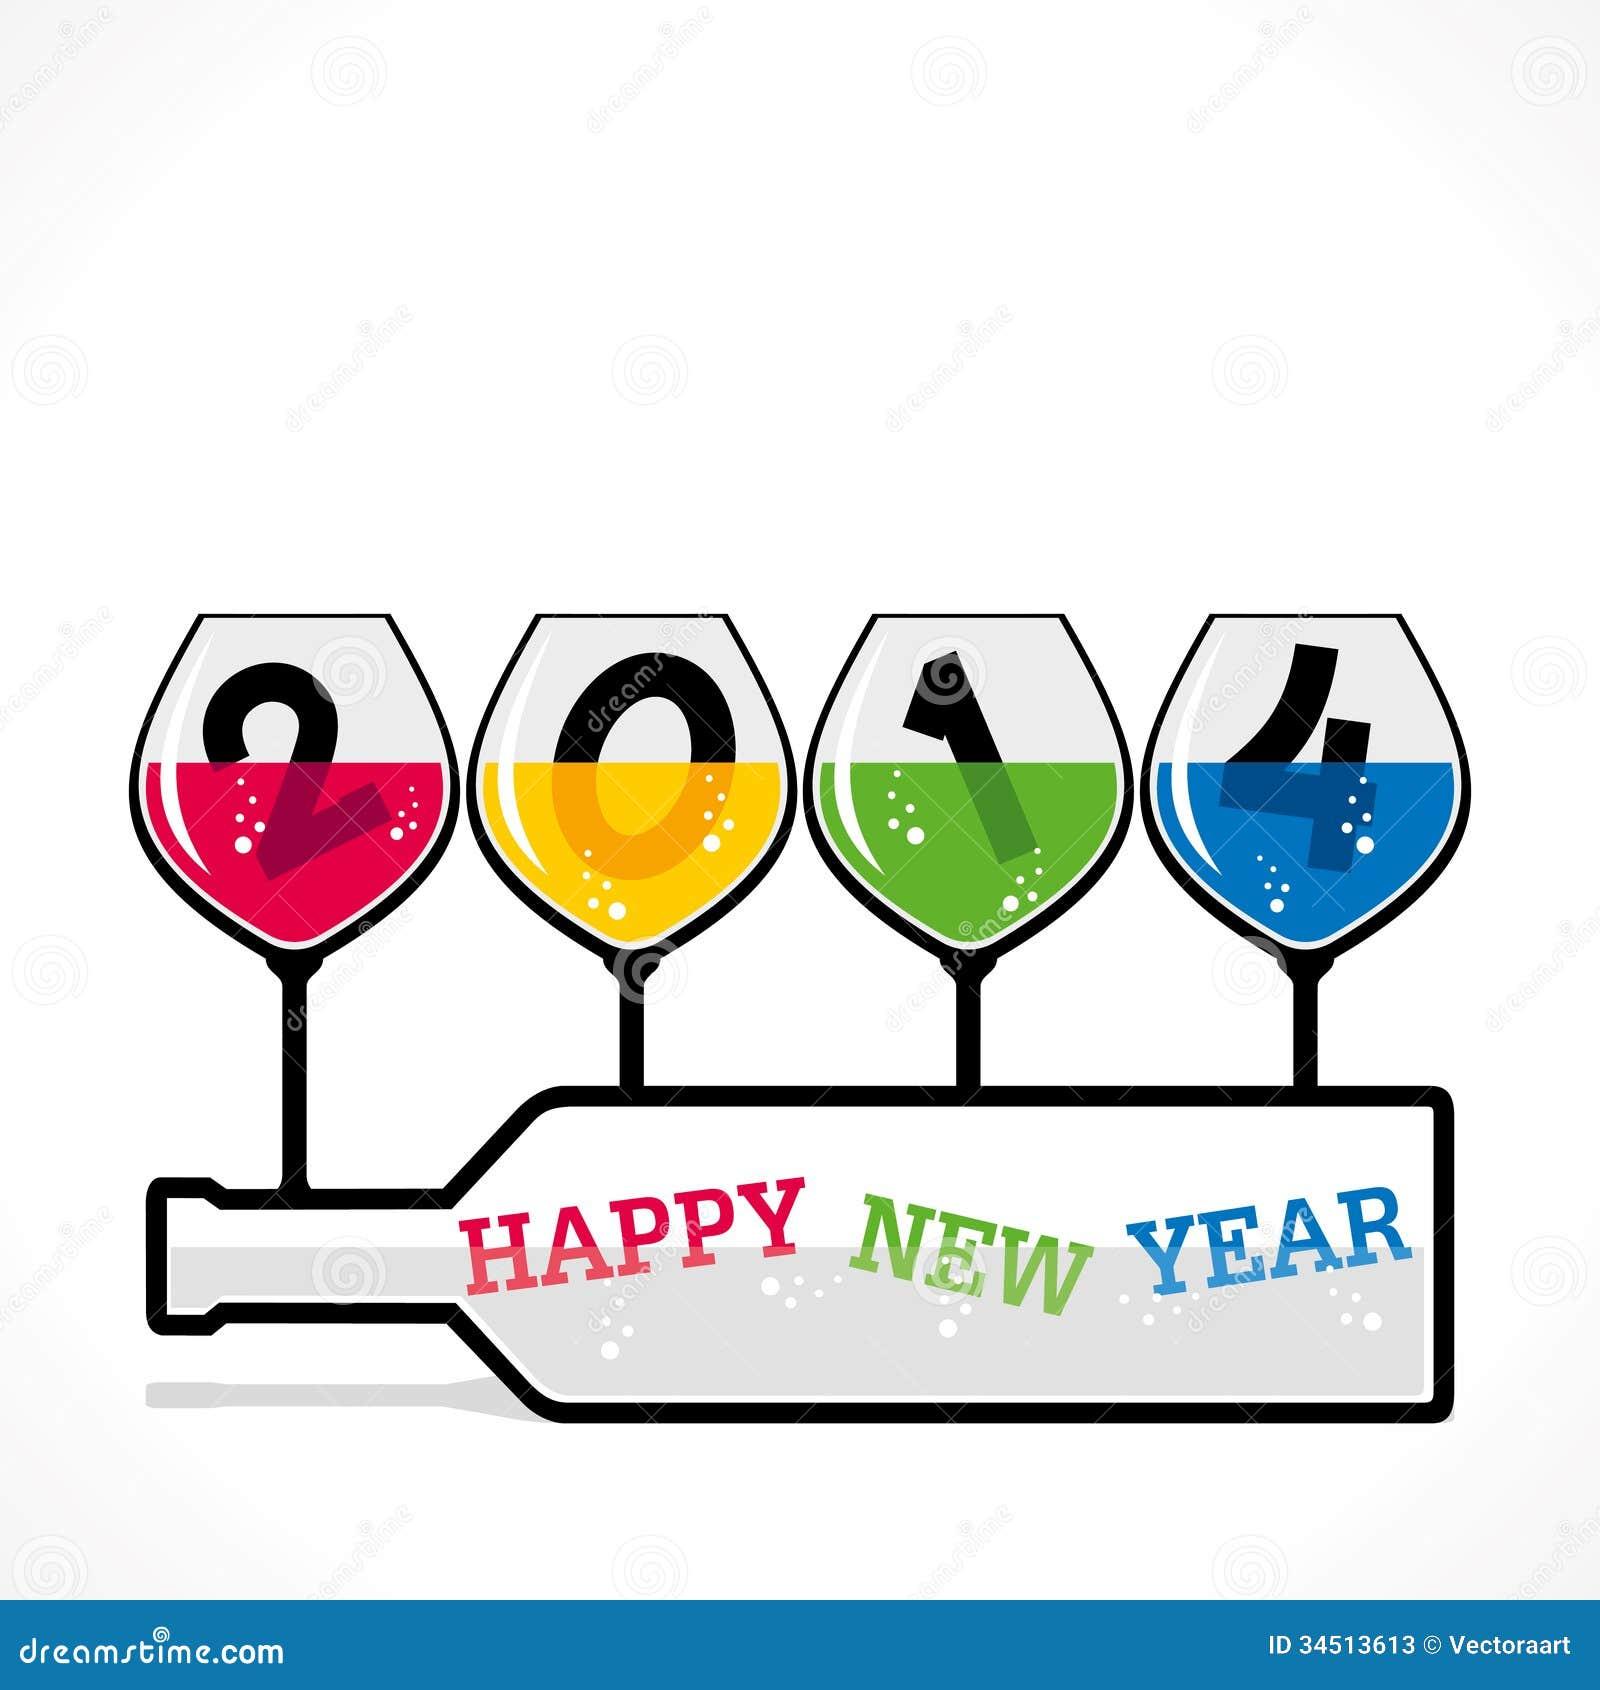 Happy New Year 2014 Stock Photos Image 34513613